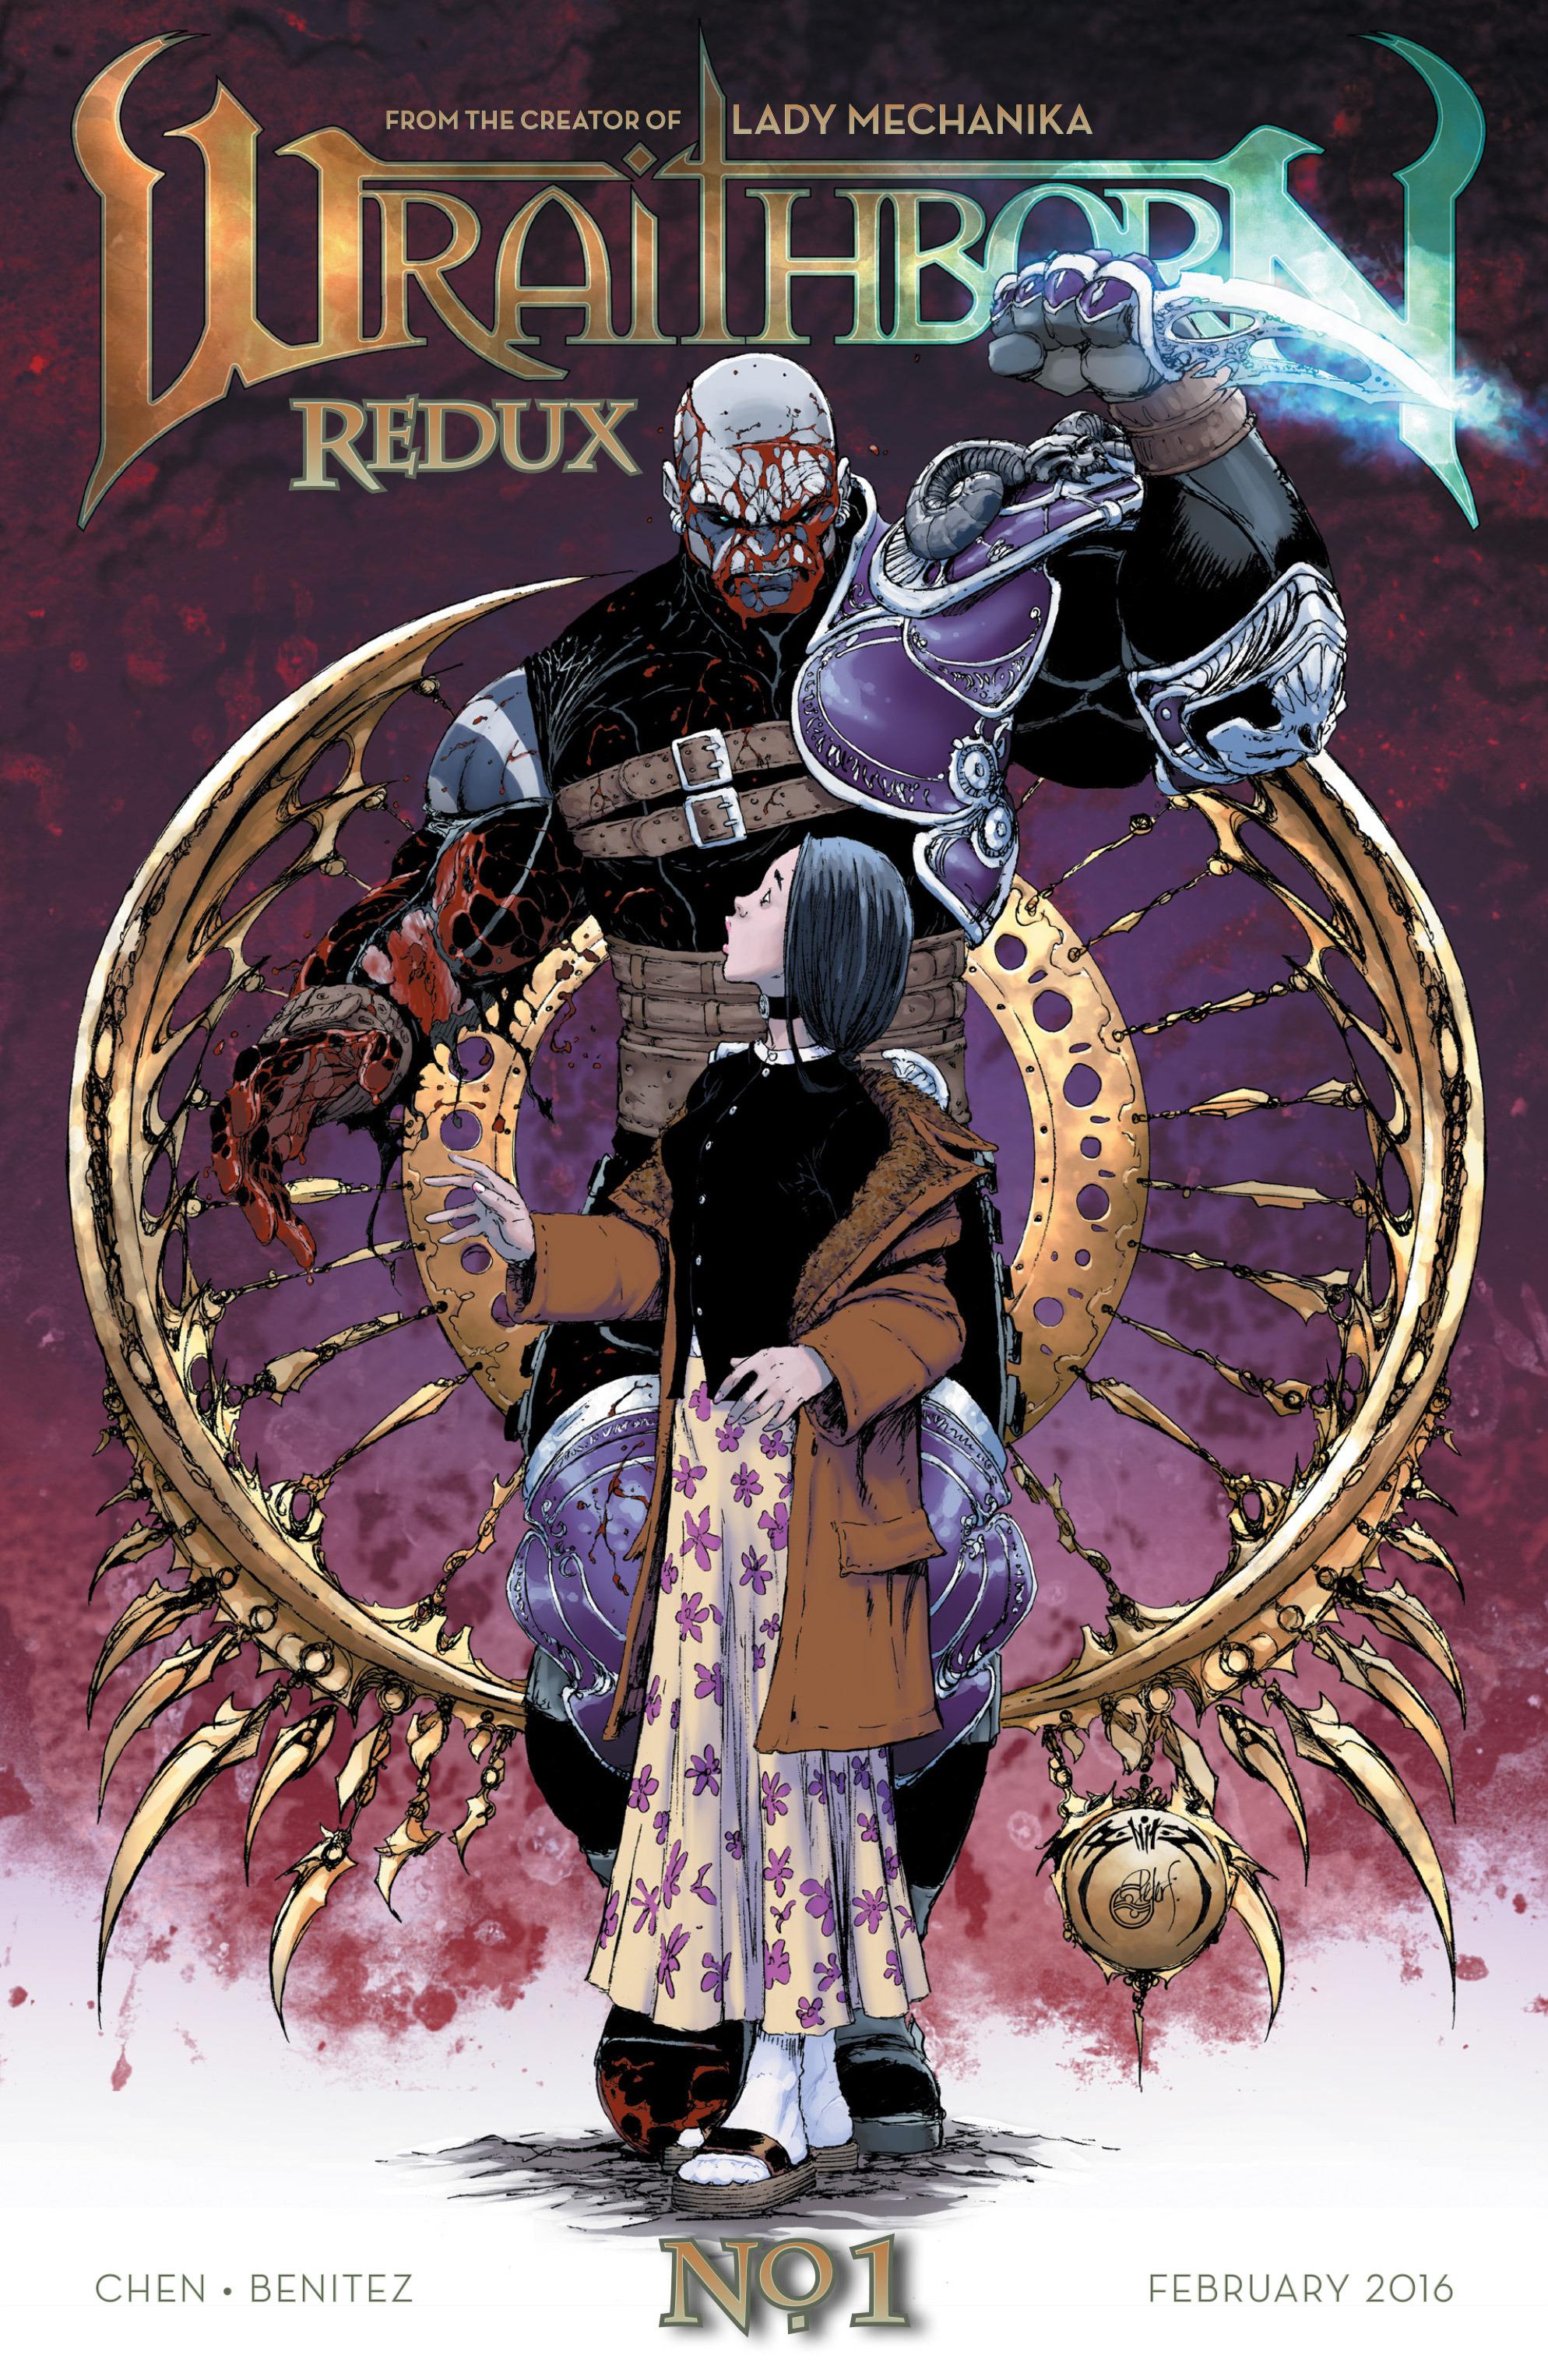 Read online Wraithborn Redux comic -  Issue #1 - 2